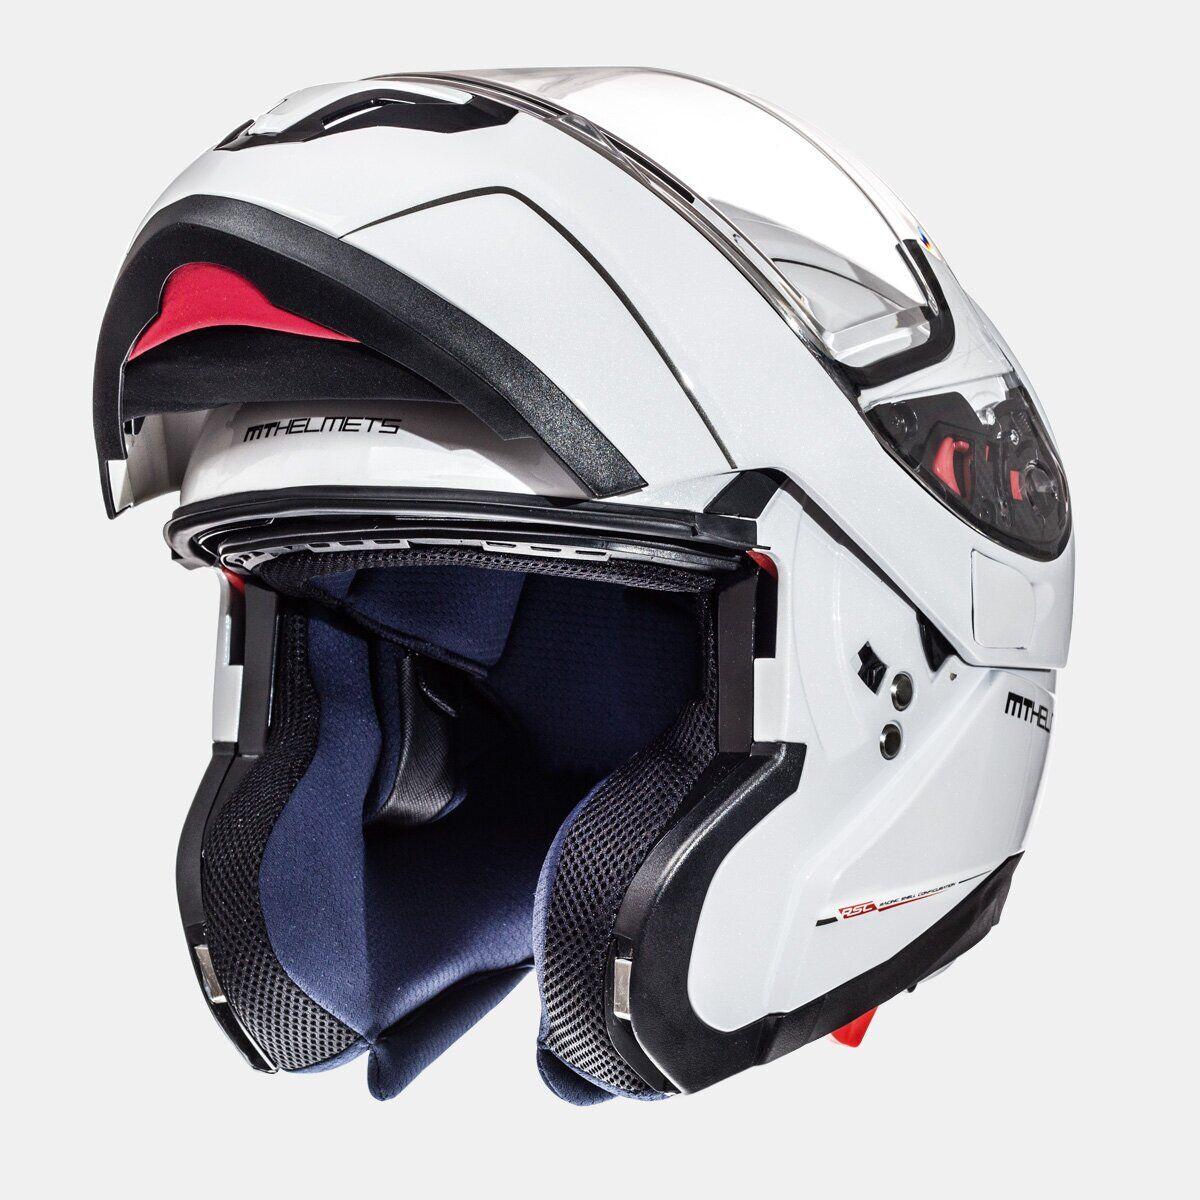 Мотошлем MT ATOM SV SOLID GLOSS WHITE  Артмото - купить квадроцикл в украине и харькове, мотоцикл, снегоход, скутер, мопед, электромобиль